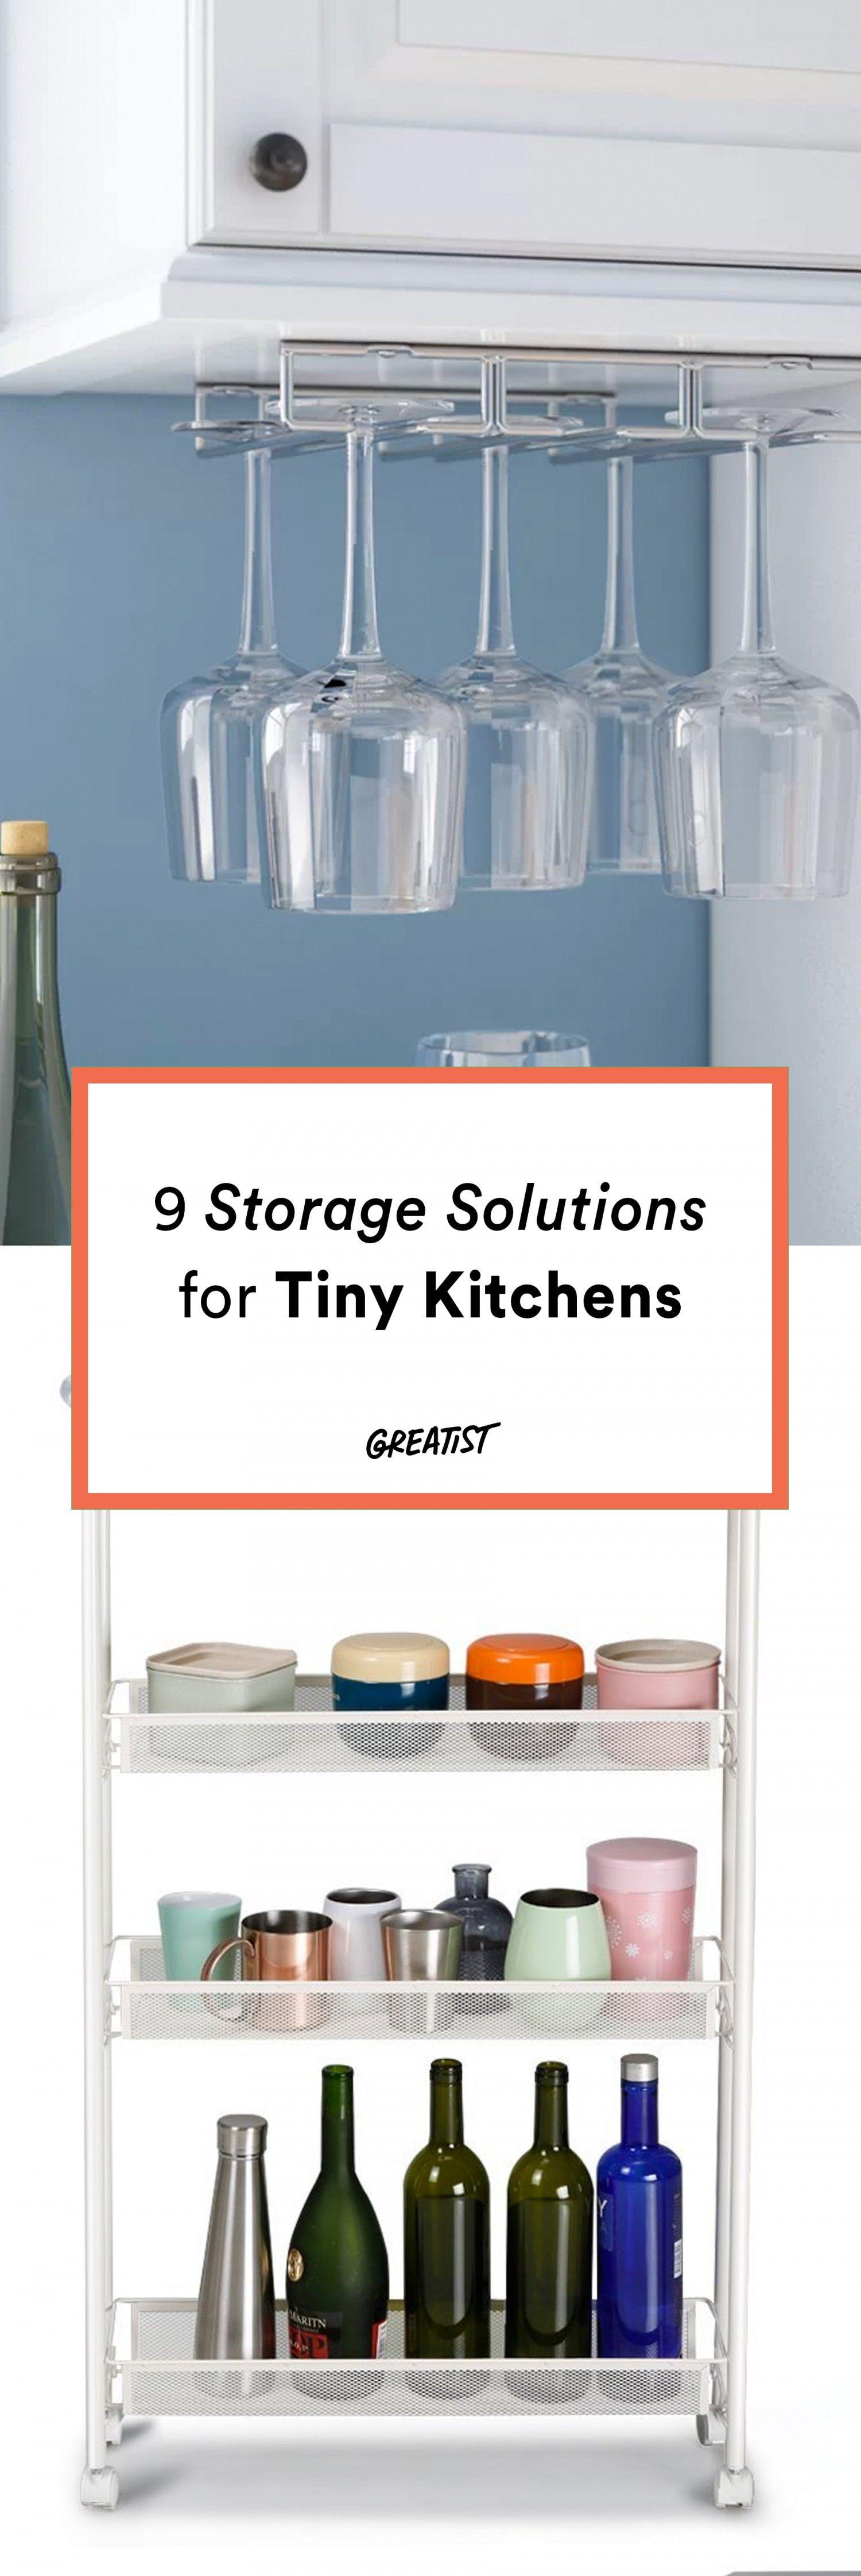 9 Storage Solutions for Tiny Kitchens | Kitchen Hacks | Pinterest ...